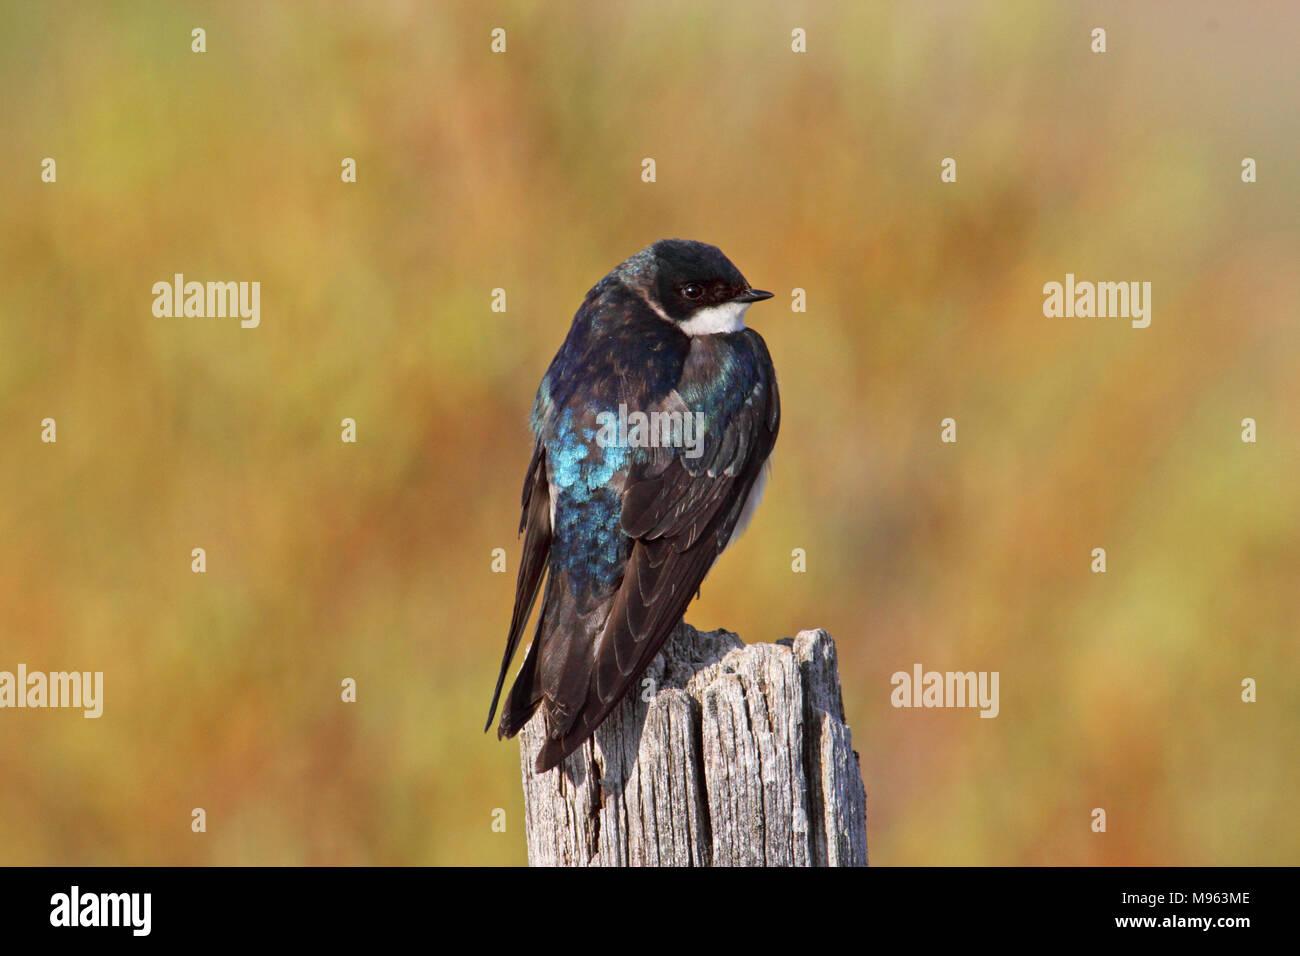 Birds of North America, tree swallow, tachycineta bicolor Stock Photo